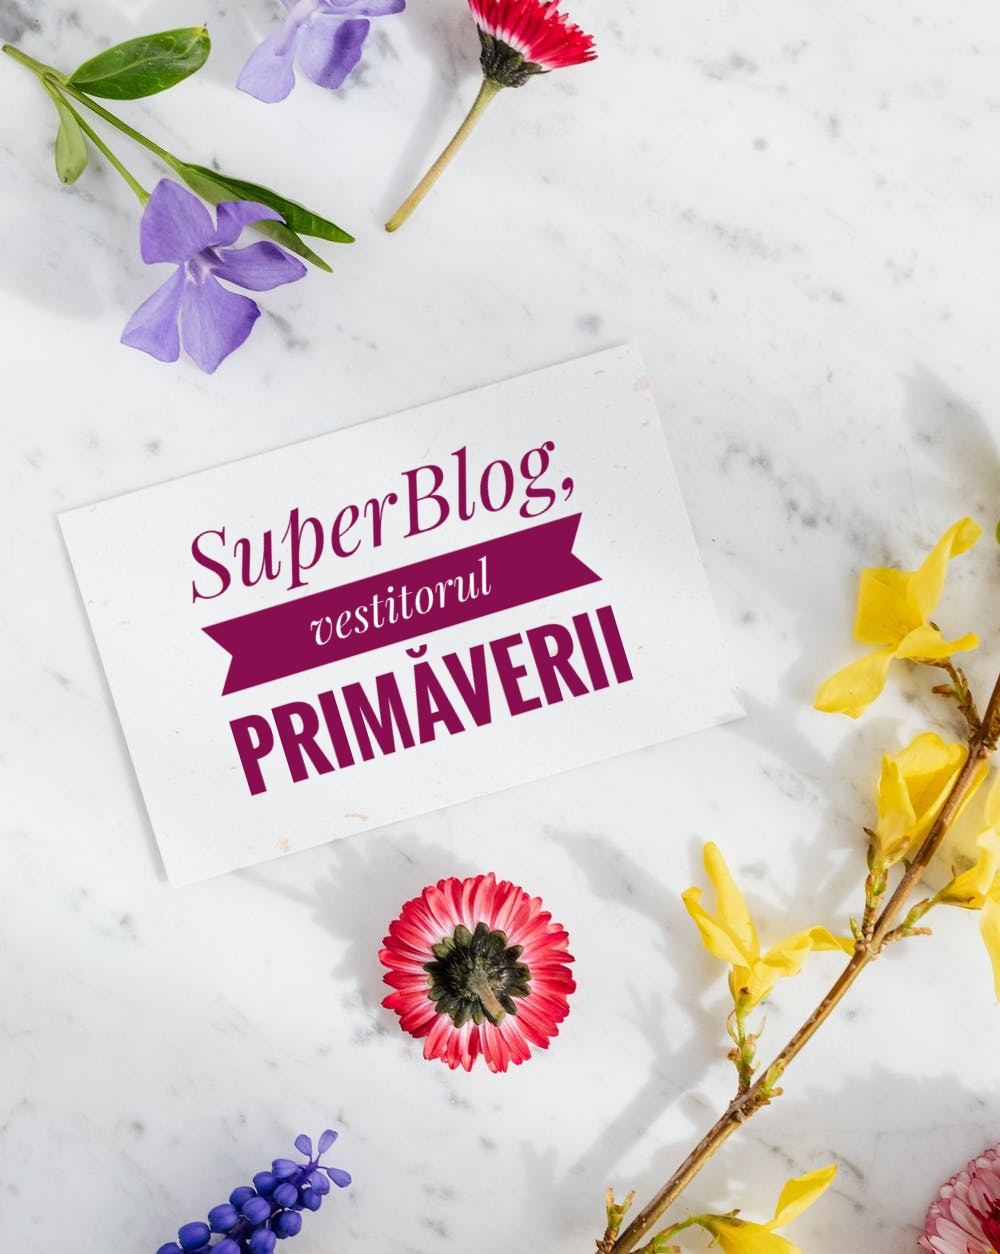 Vine, vine primăvara cu Spring SuperBlog